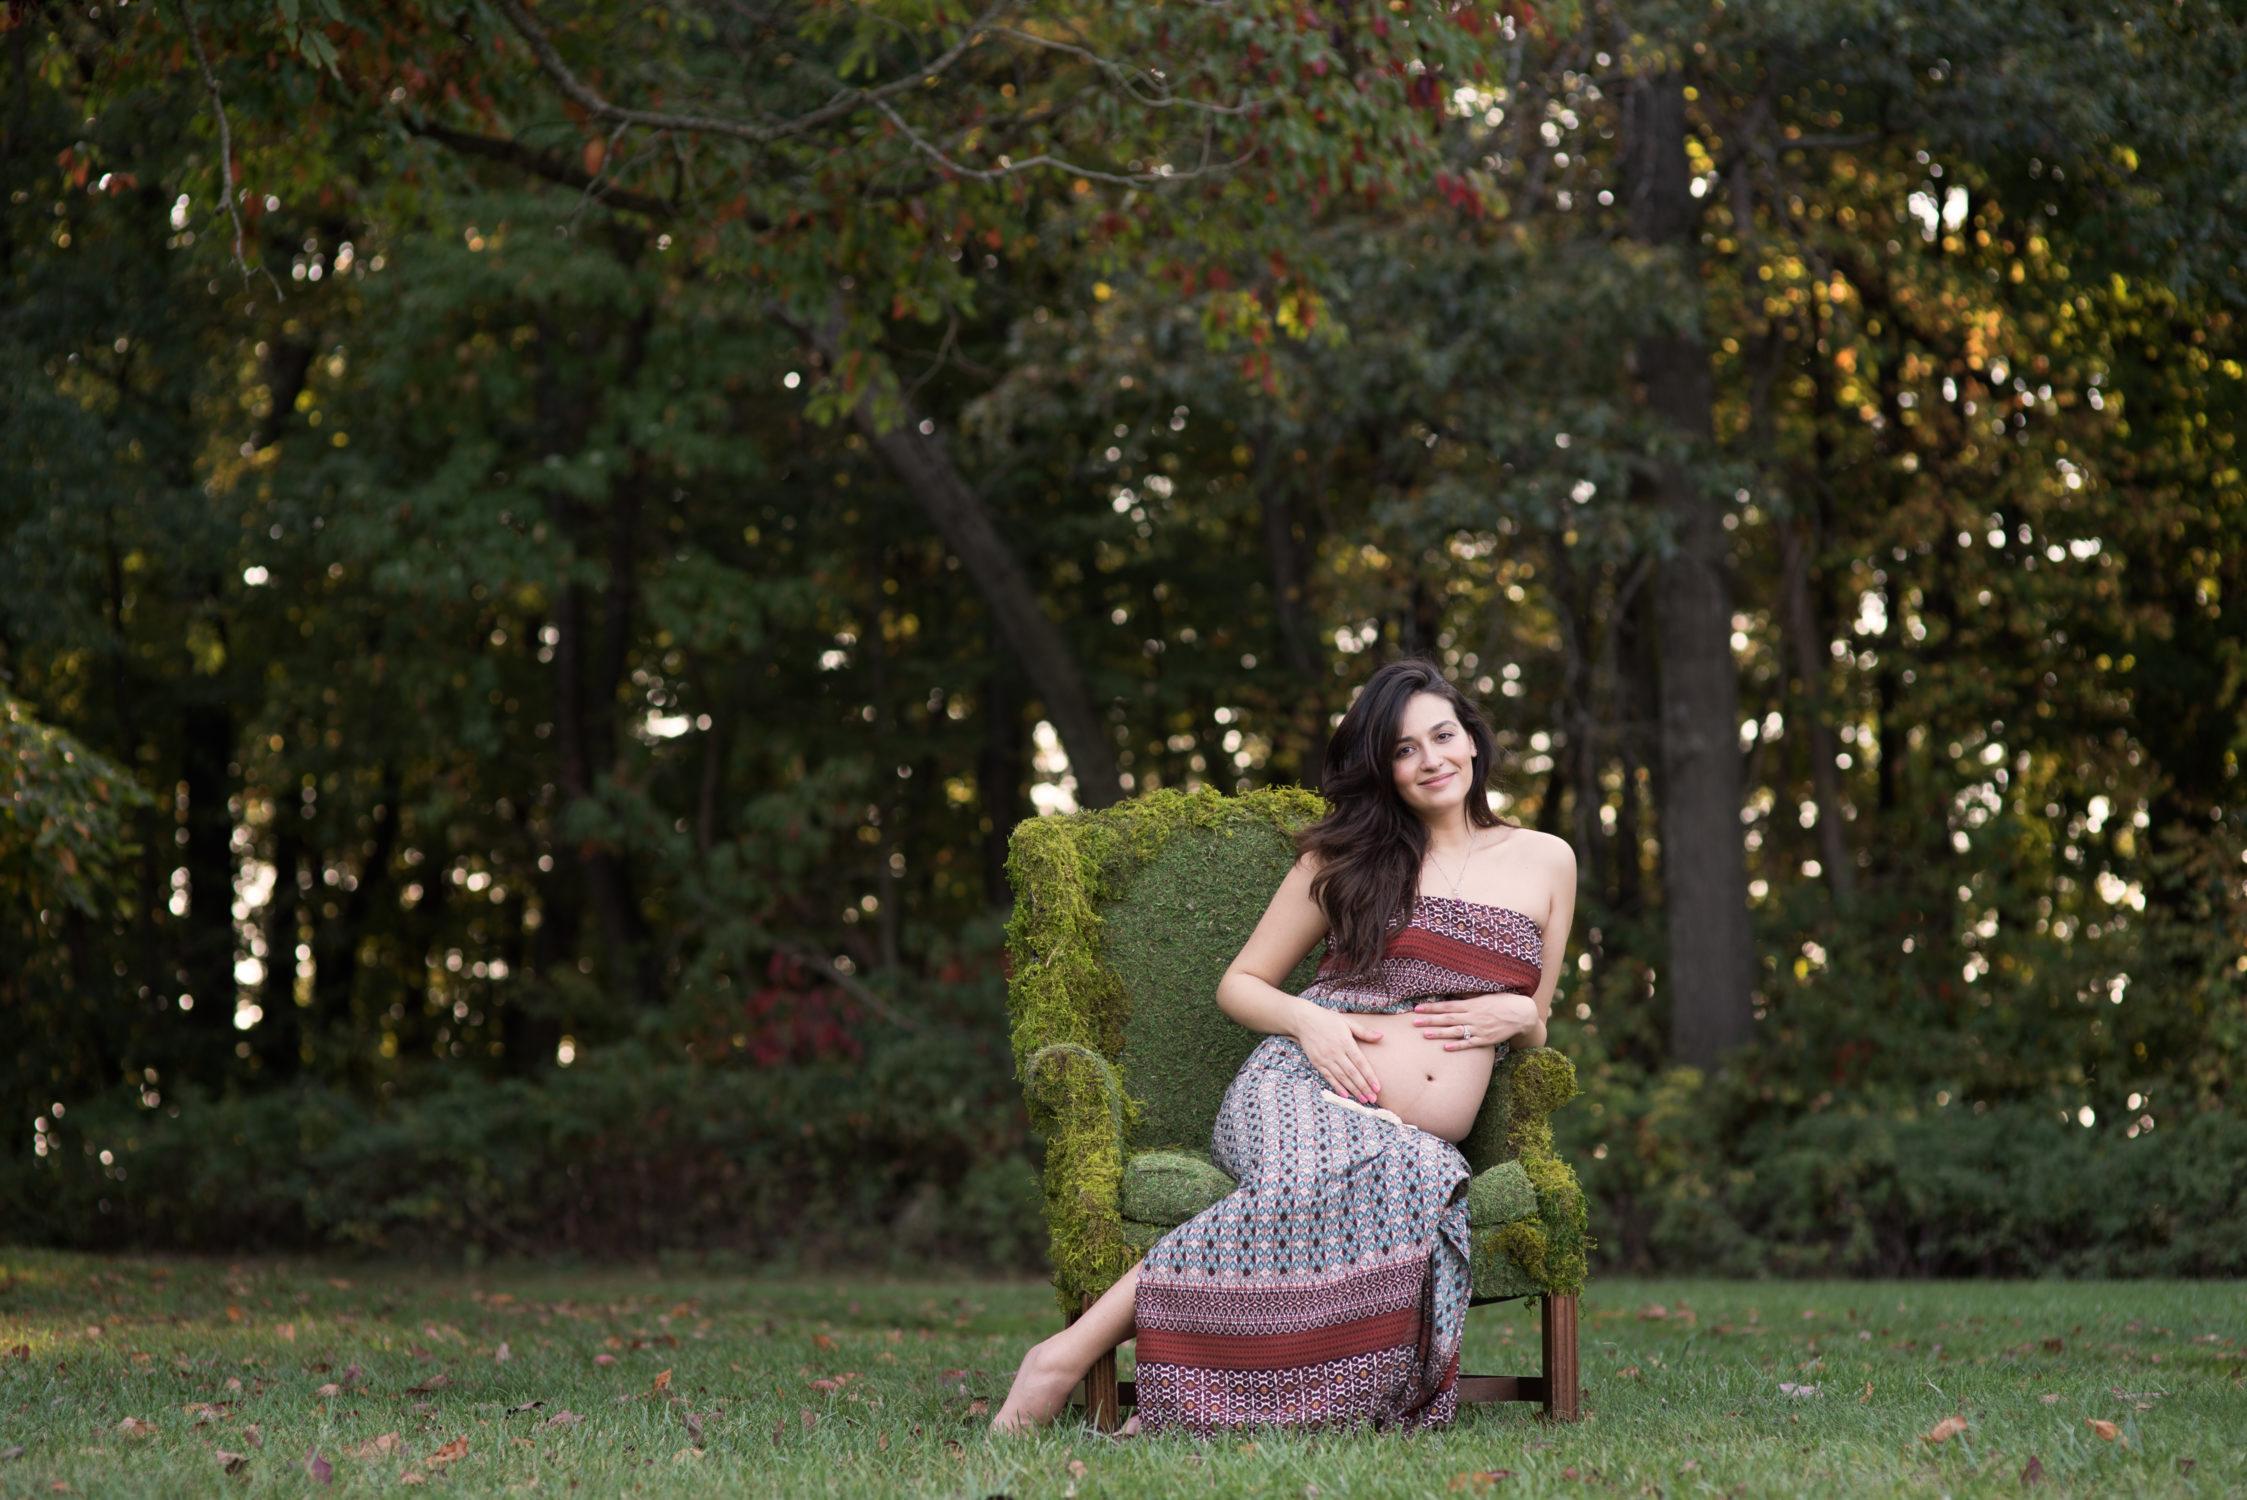 Macomb County, Motherhood, photographer, pregnancy, maternity, baby bump, gorgeous